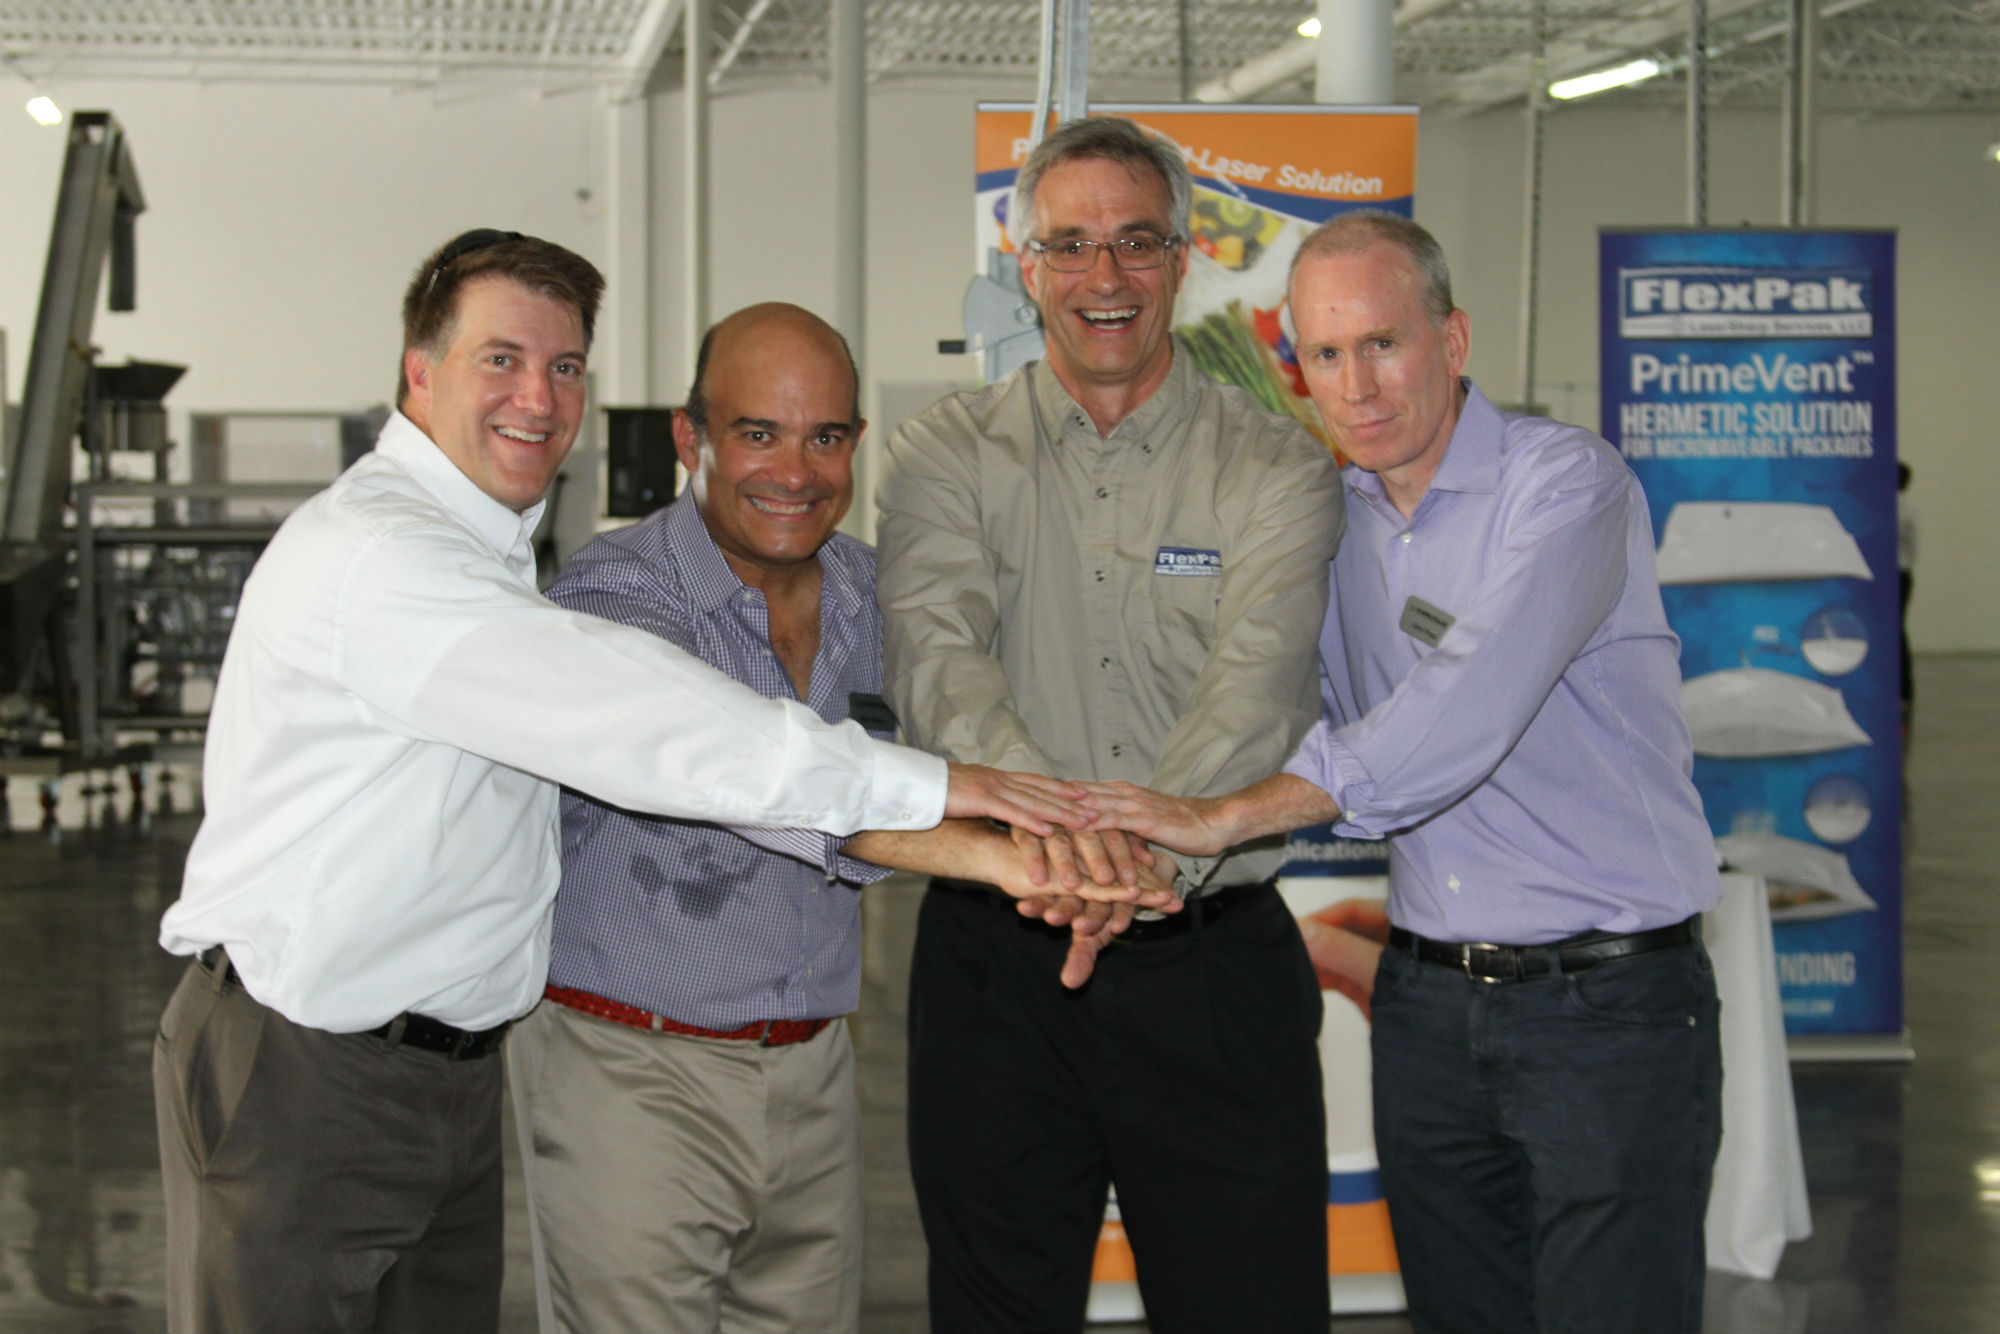 karlville and flexpak laser partnership